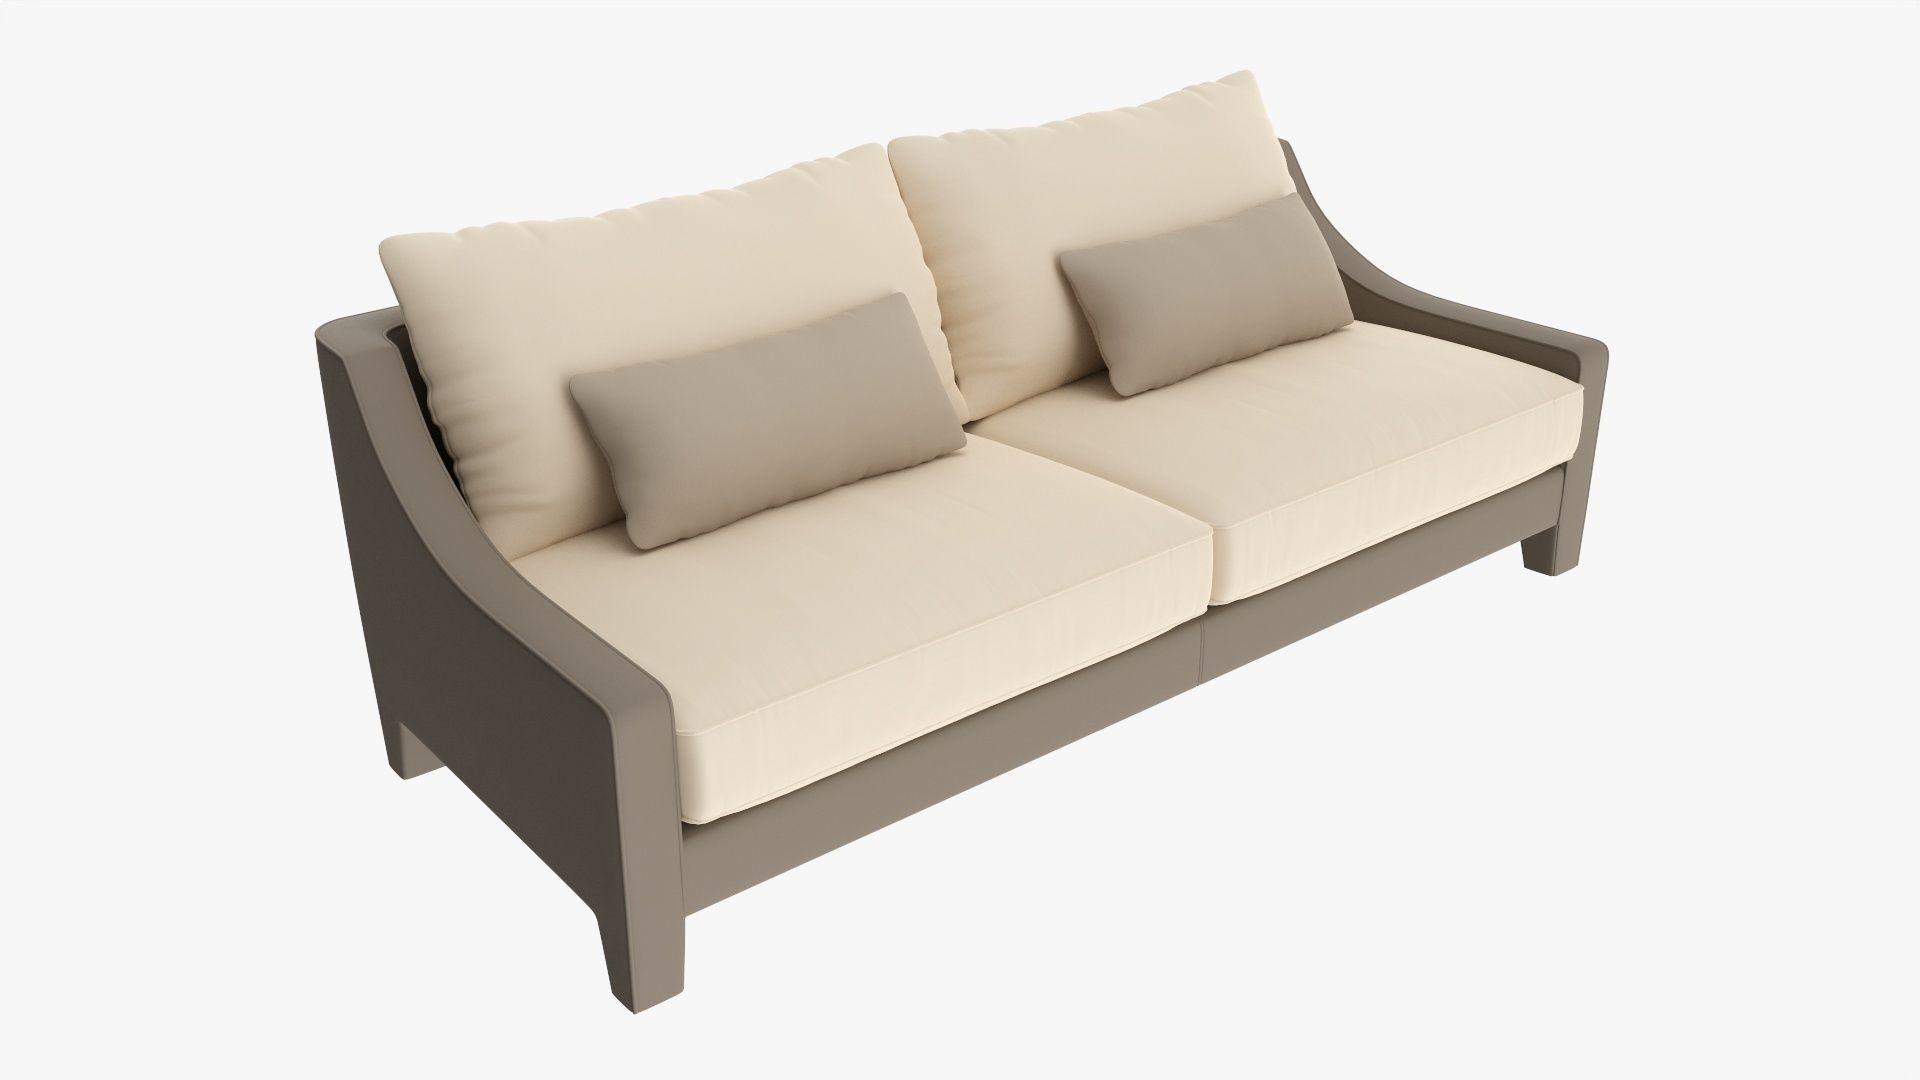 Loveseat sofa 03